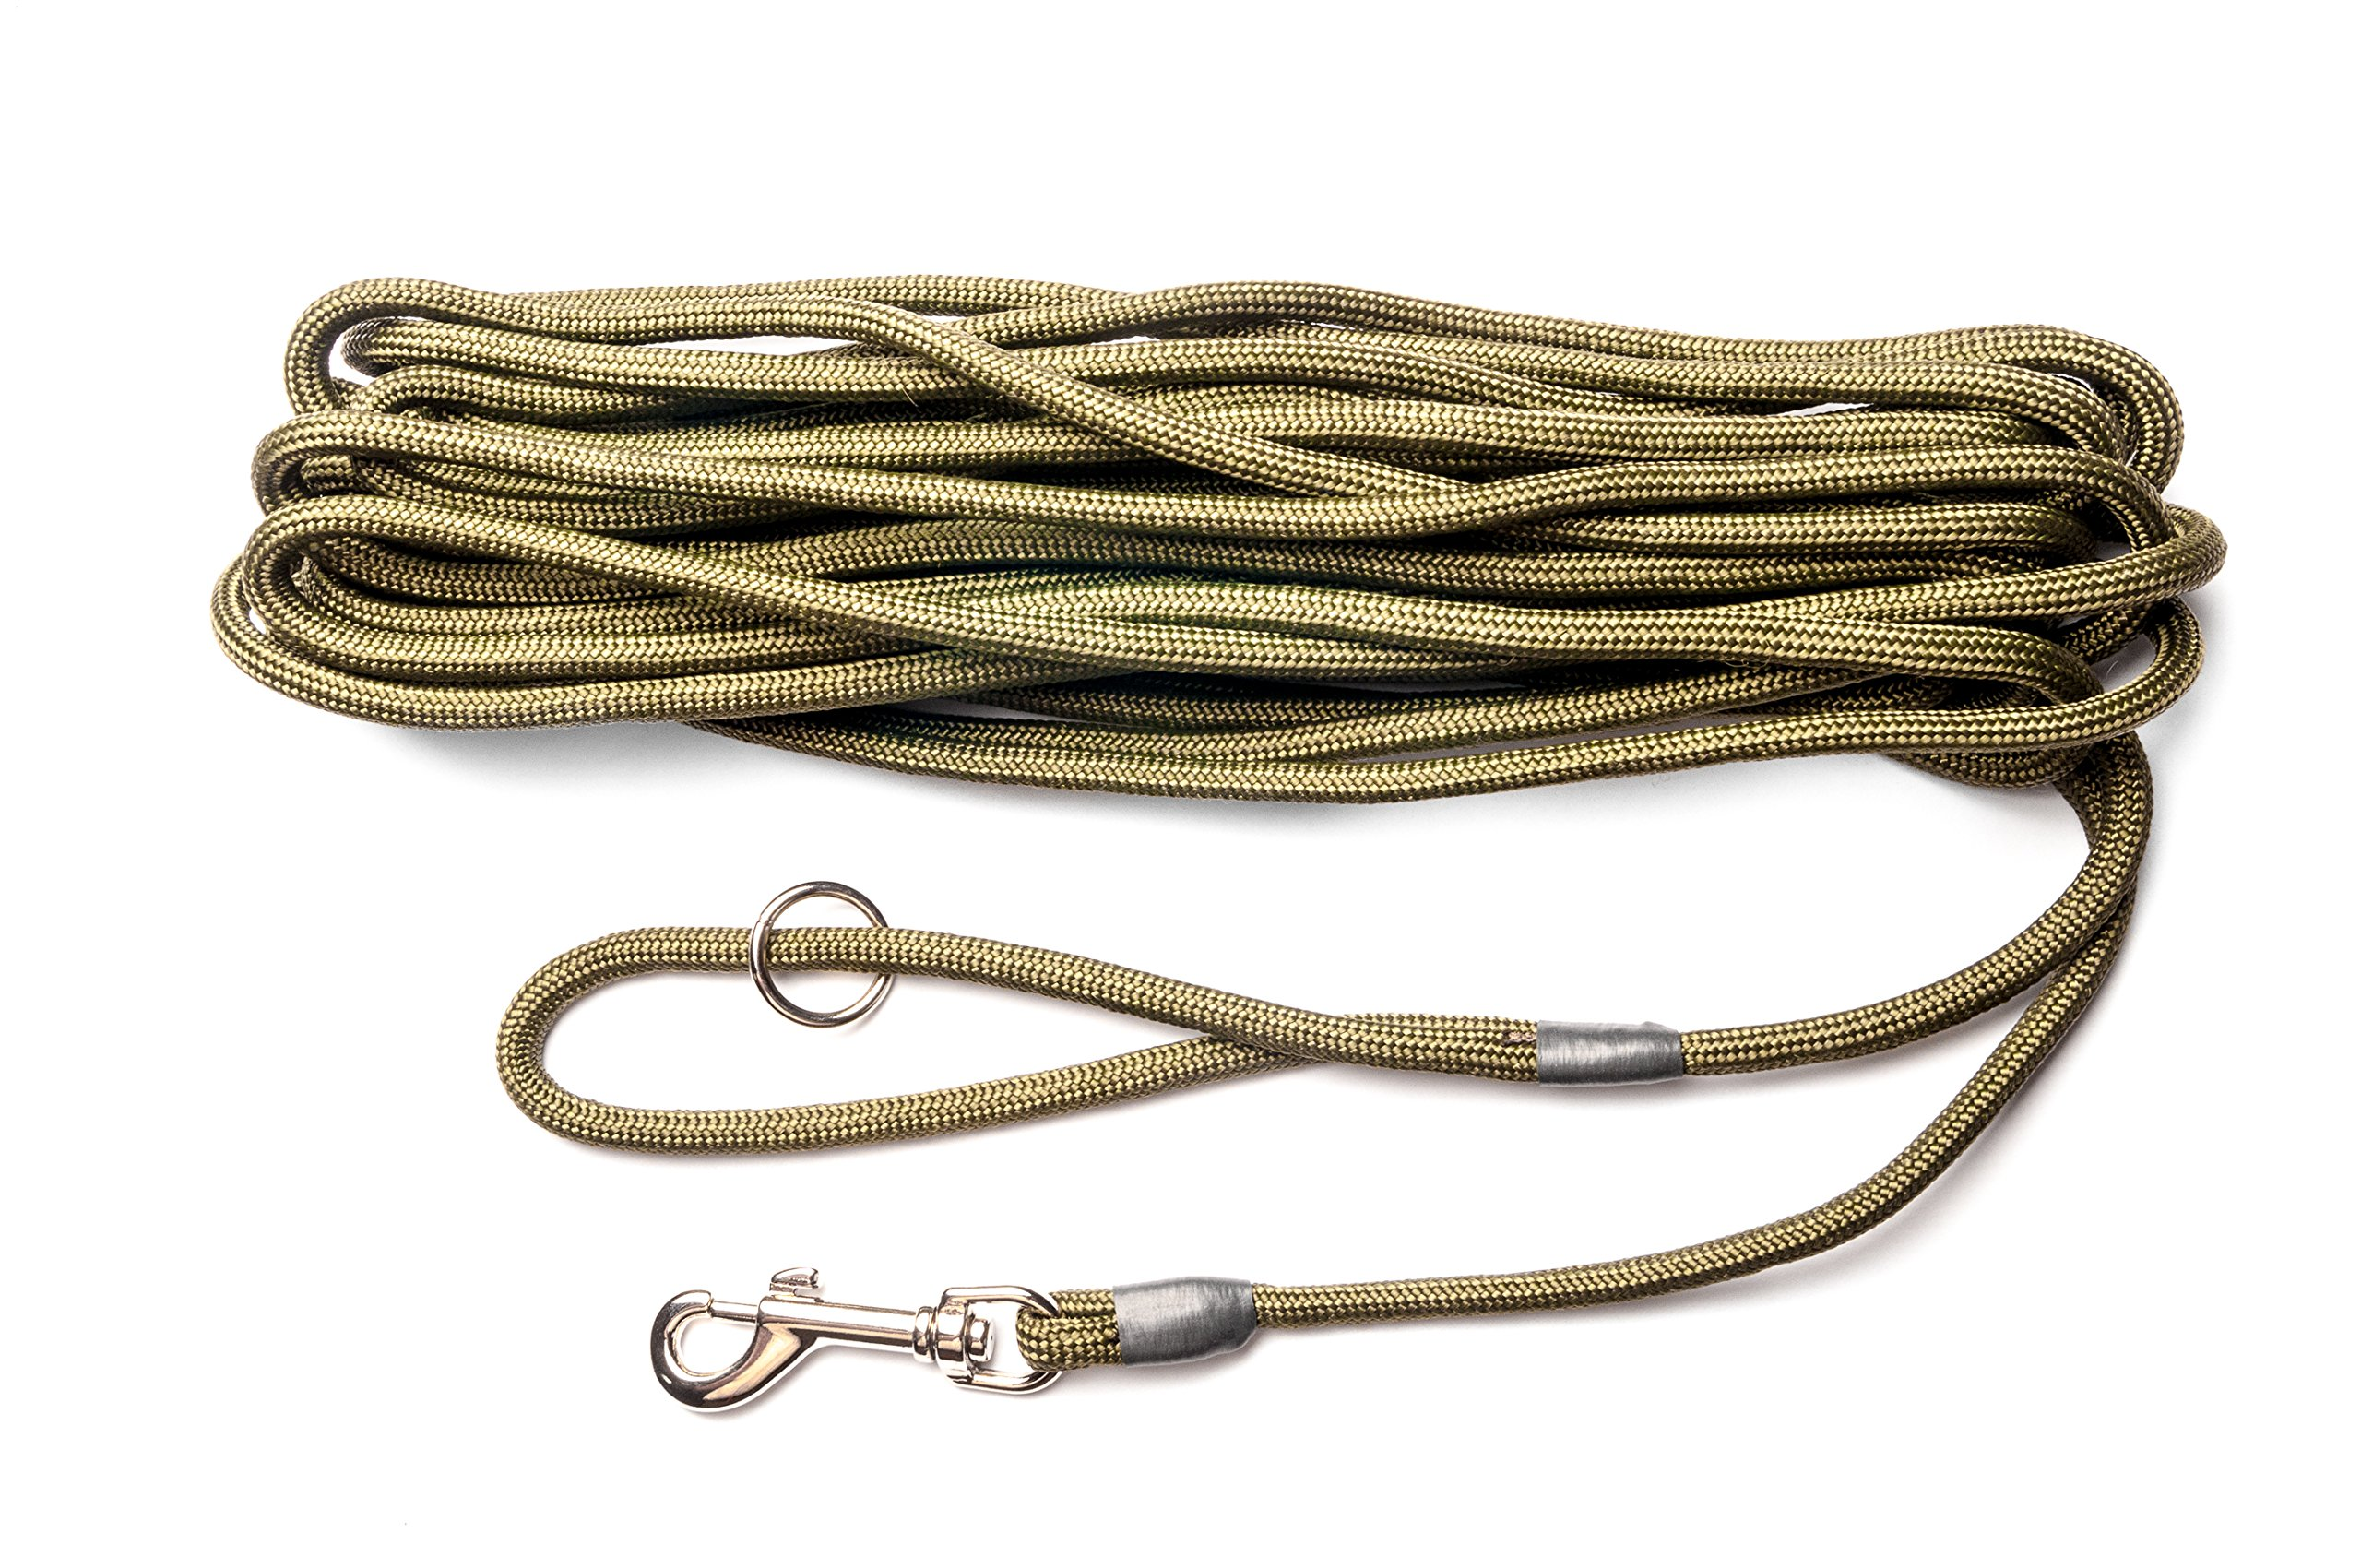 Dog & Field 2in1 30 Foot Training/Exercise Dog Leash - Super Soft Braided Nylon